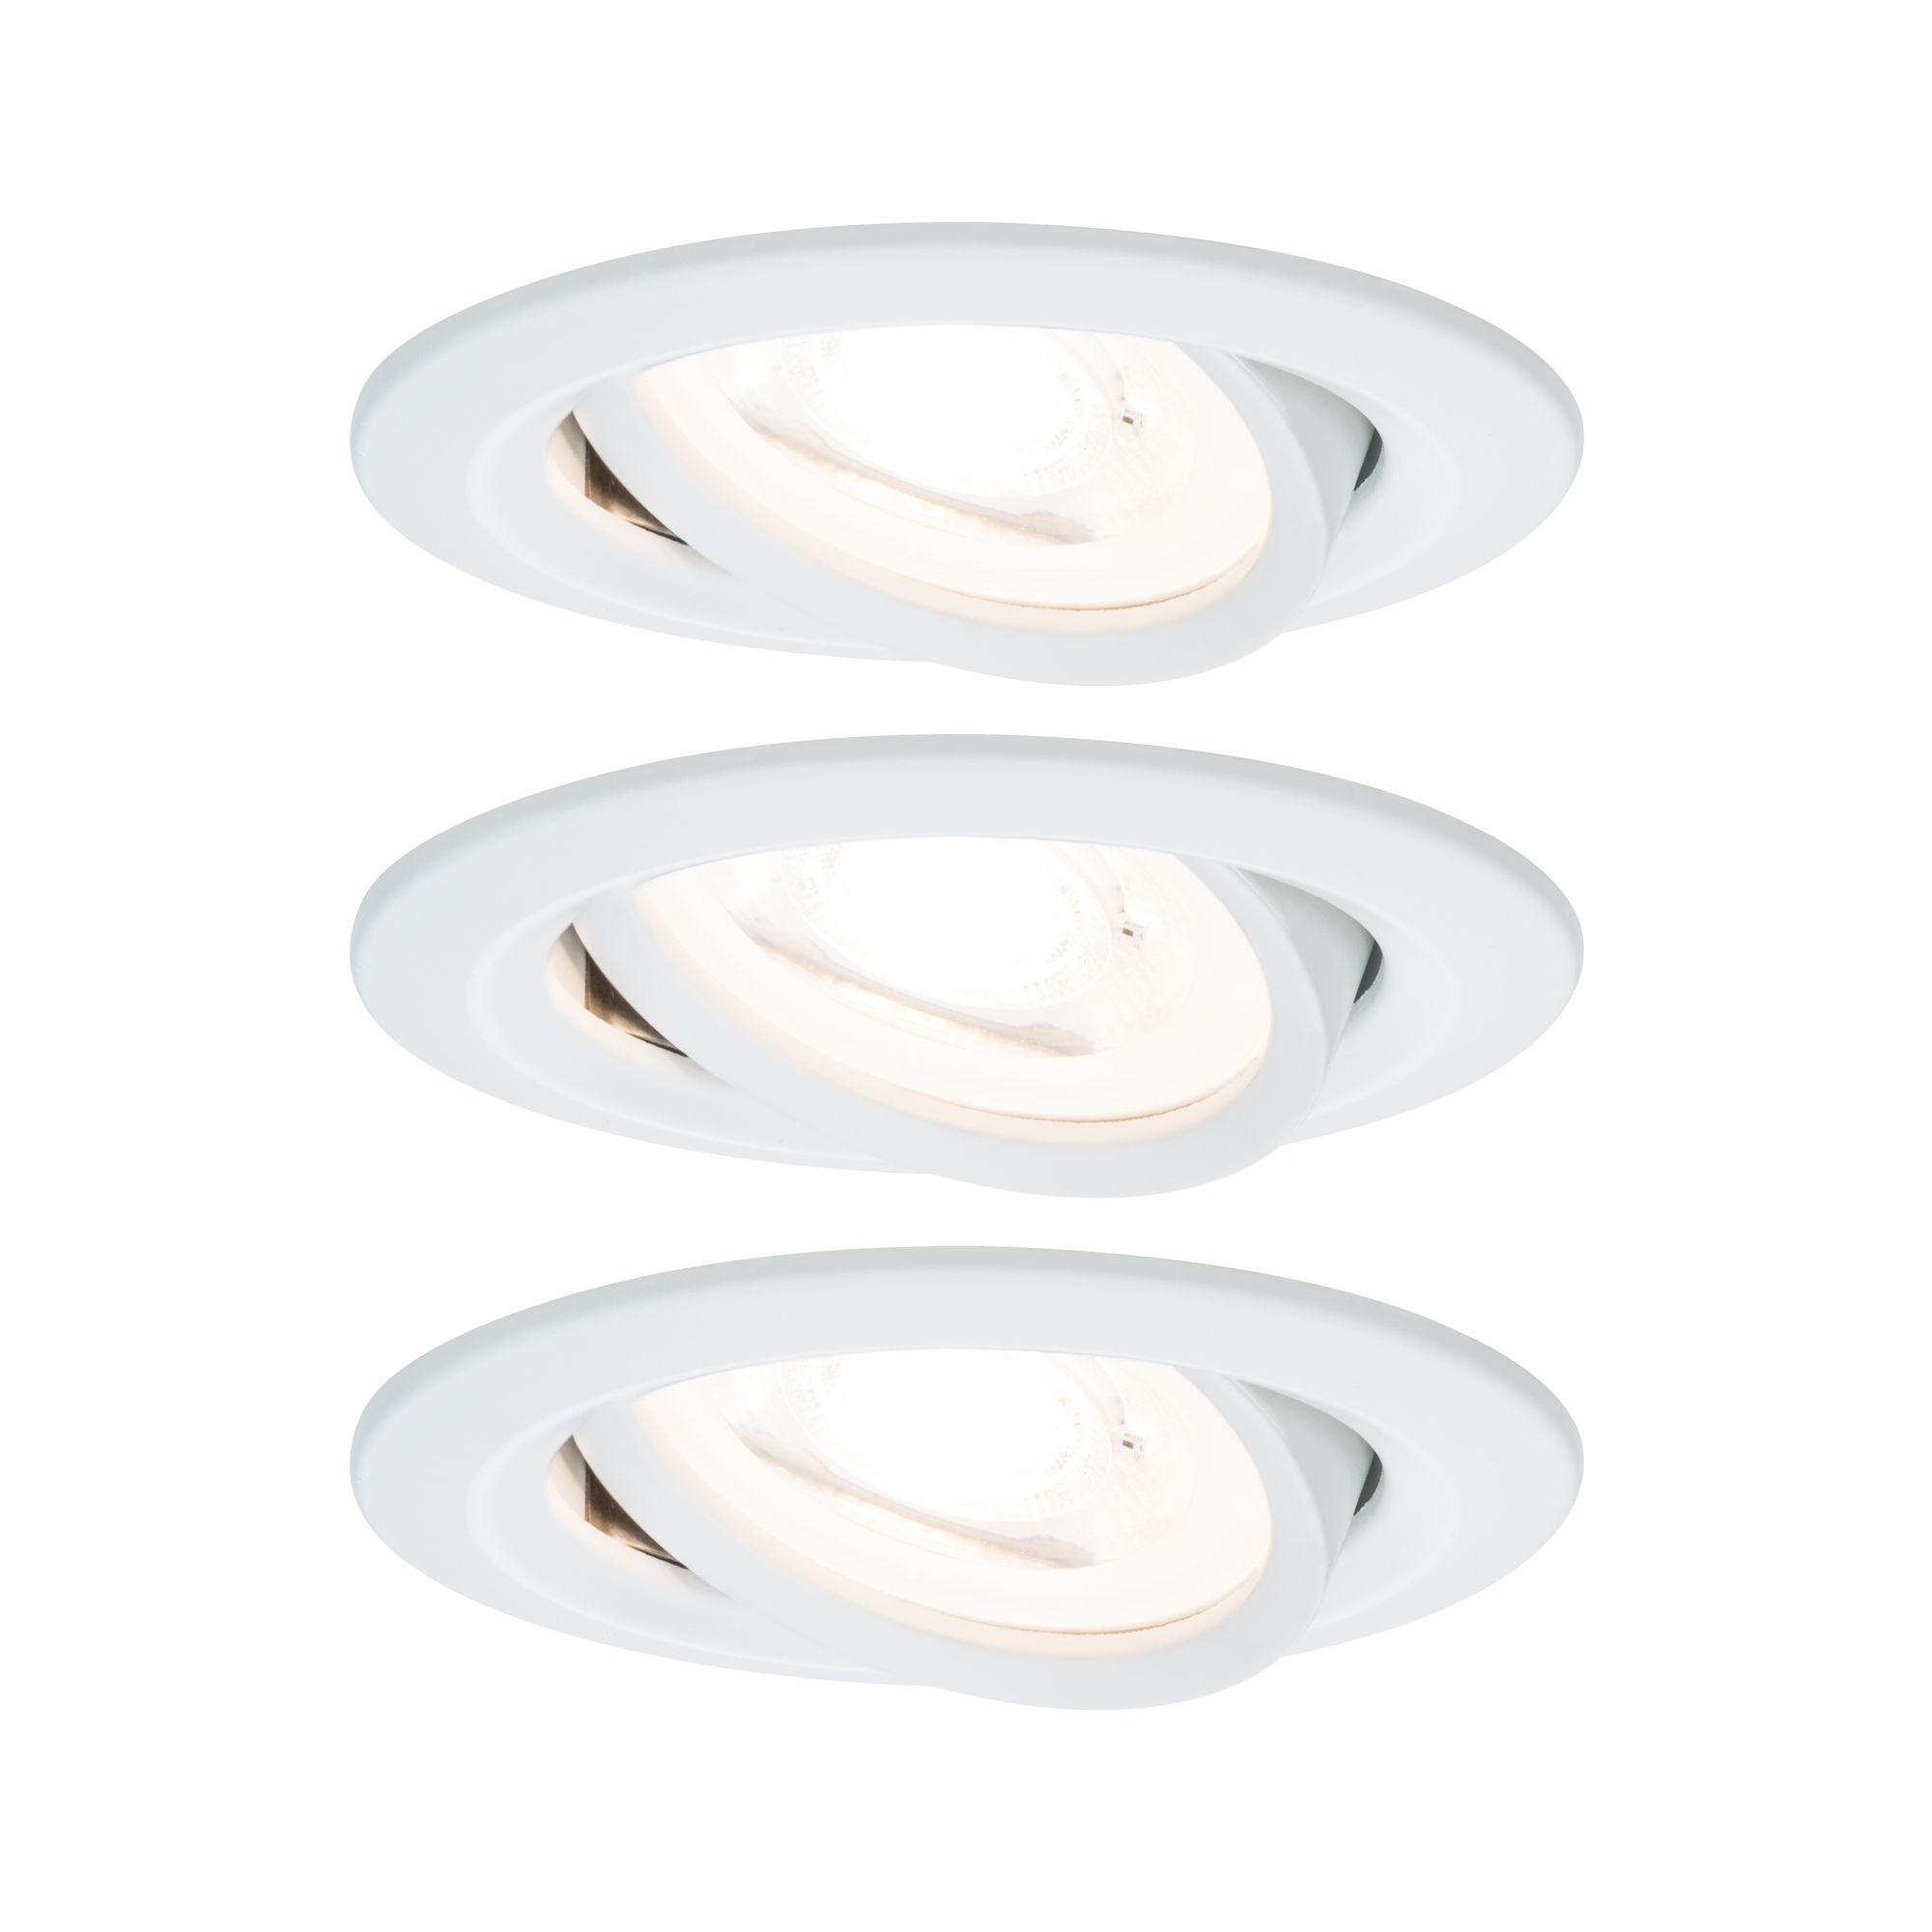 Paulmann EBL Set Nova rund schwenkbar LED 3x6,5W2700K 230V GU10 51mm Weiß matt/Alu